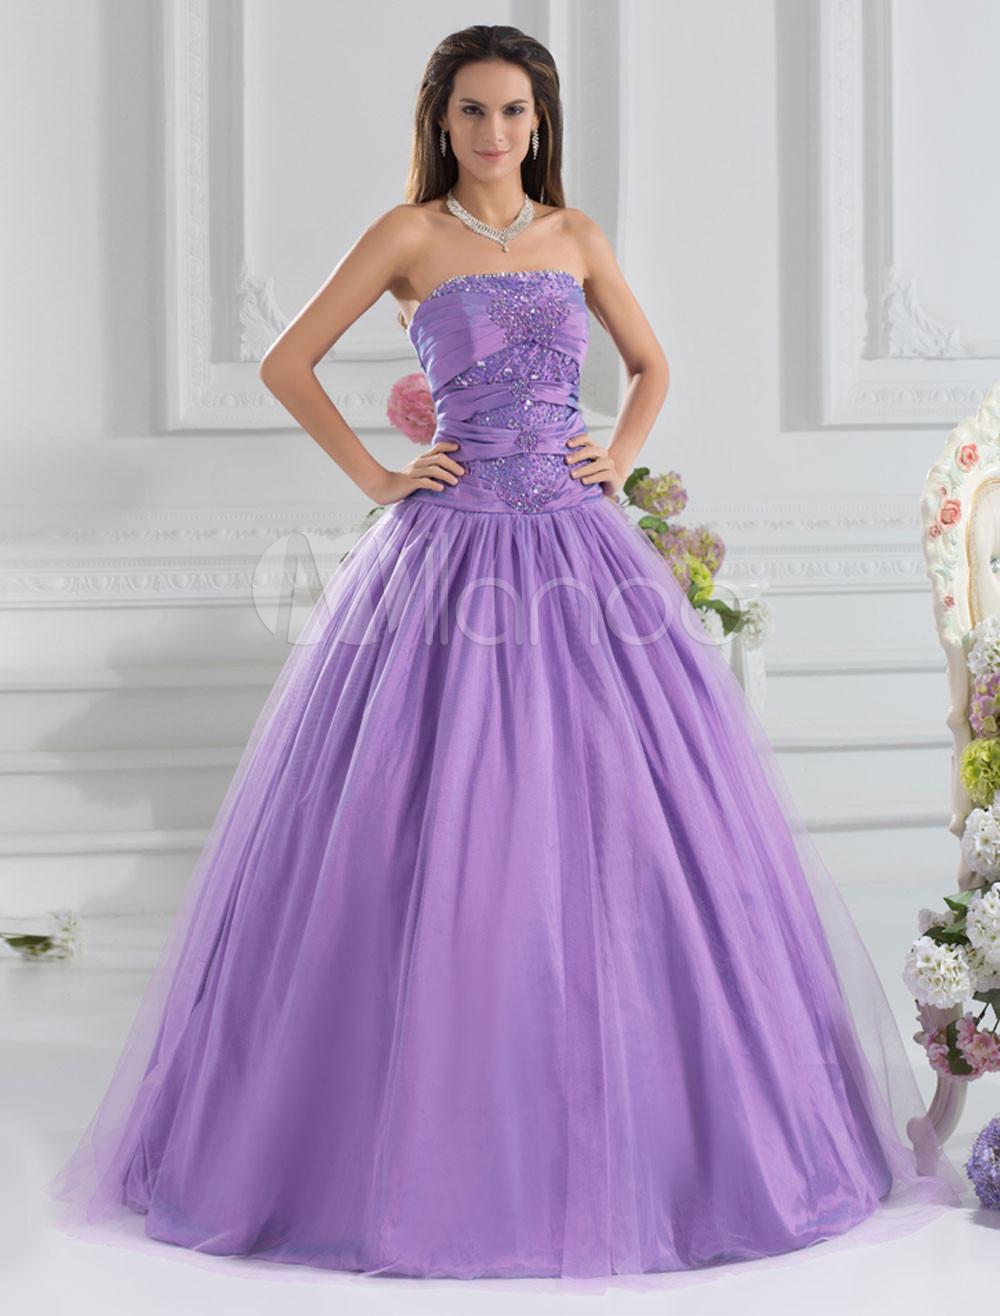 Formal Lilac Shiny Beading Taffeta Strapless Fashion Ball Gown